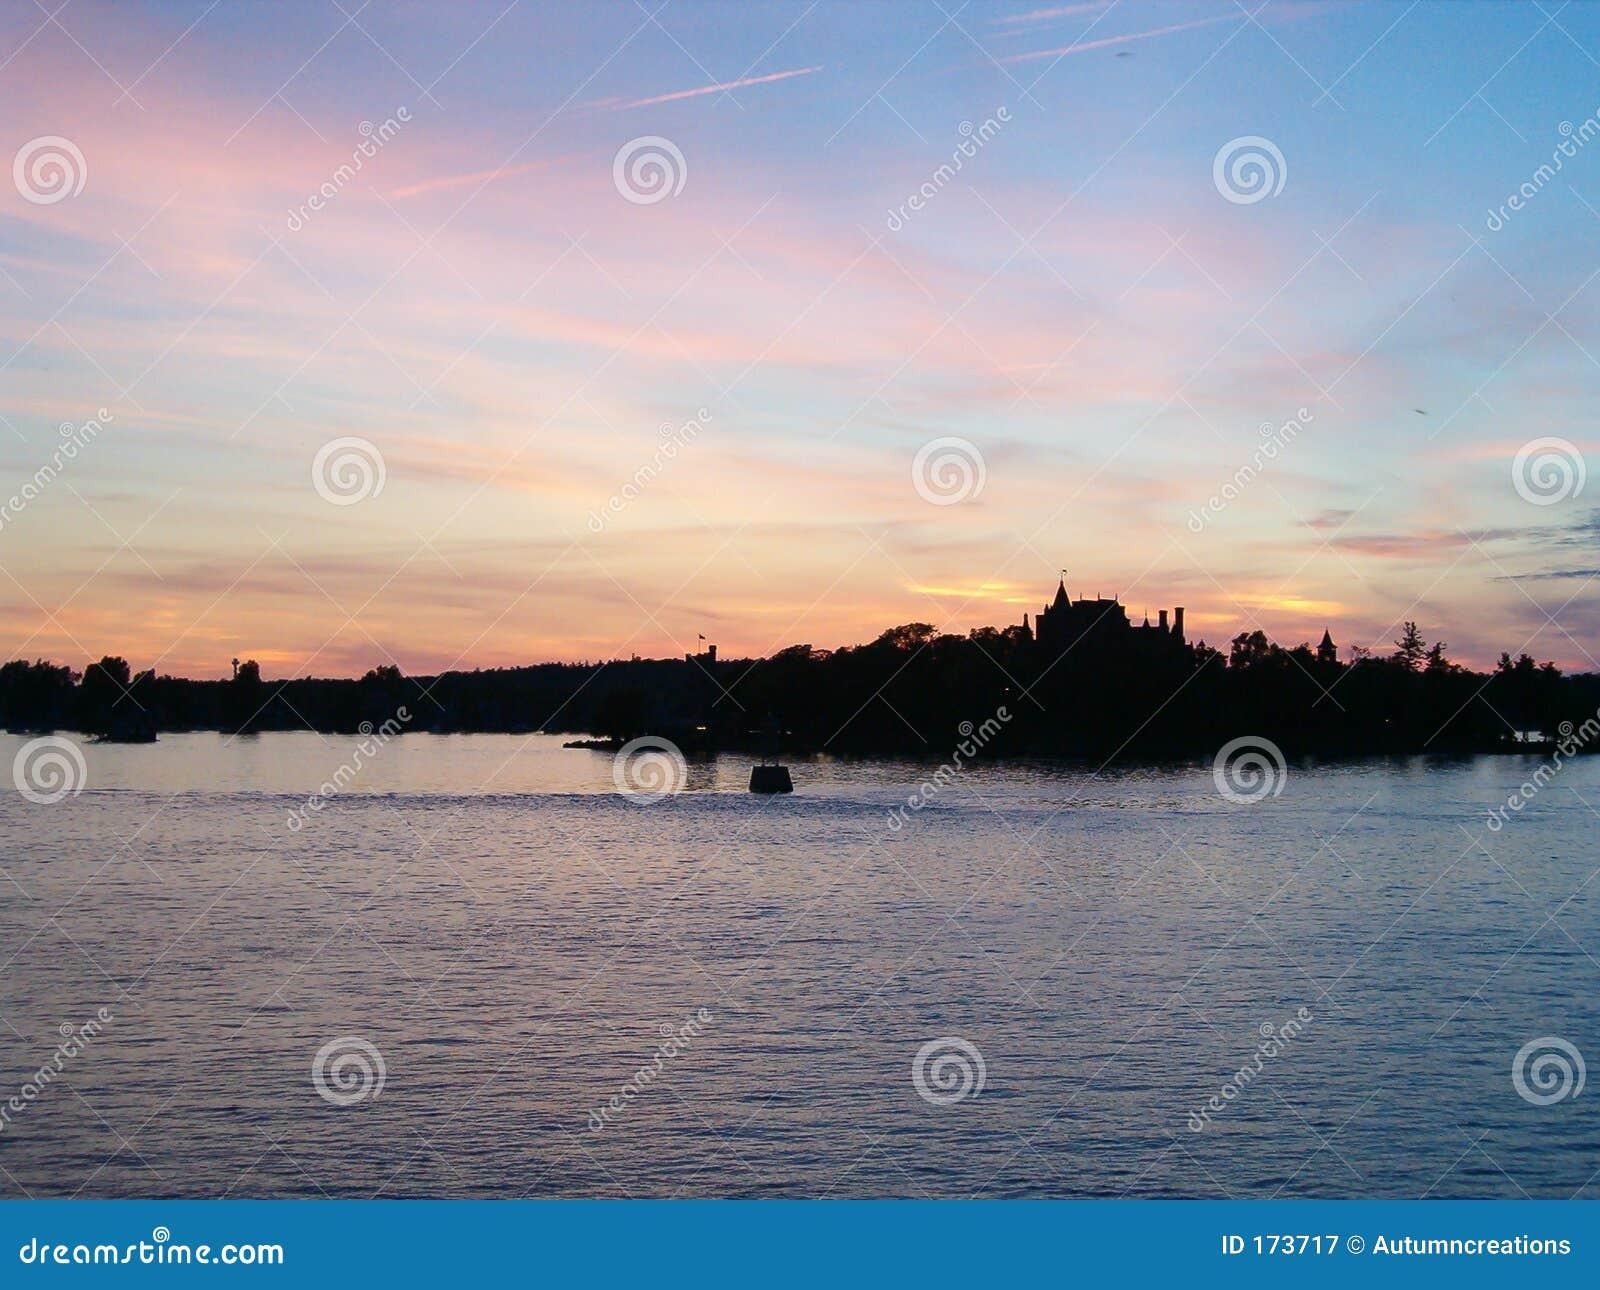 Pastel castle in the sky